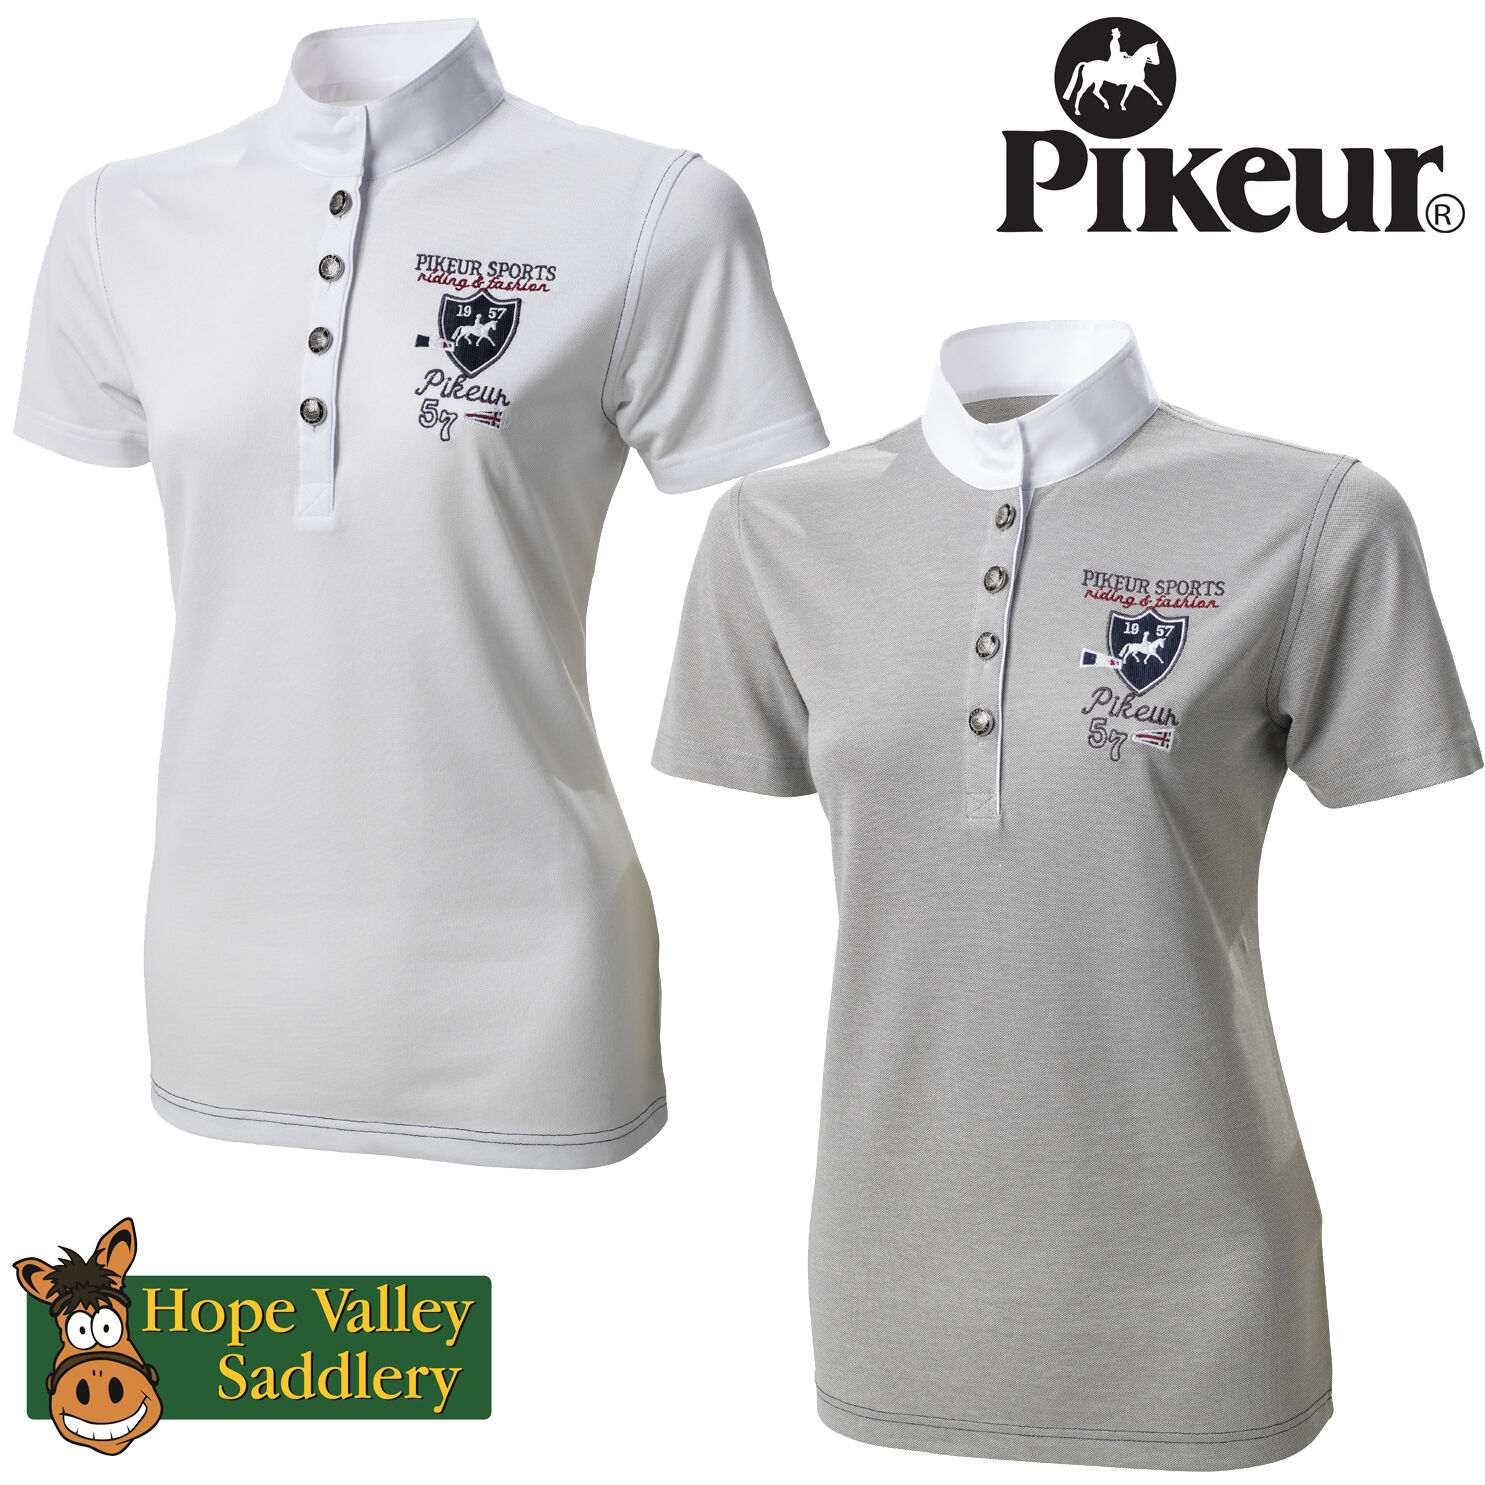 Pikeur  Ladies Compeition Shirt (498) BNWT  perfect